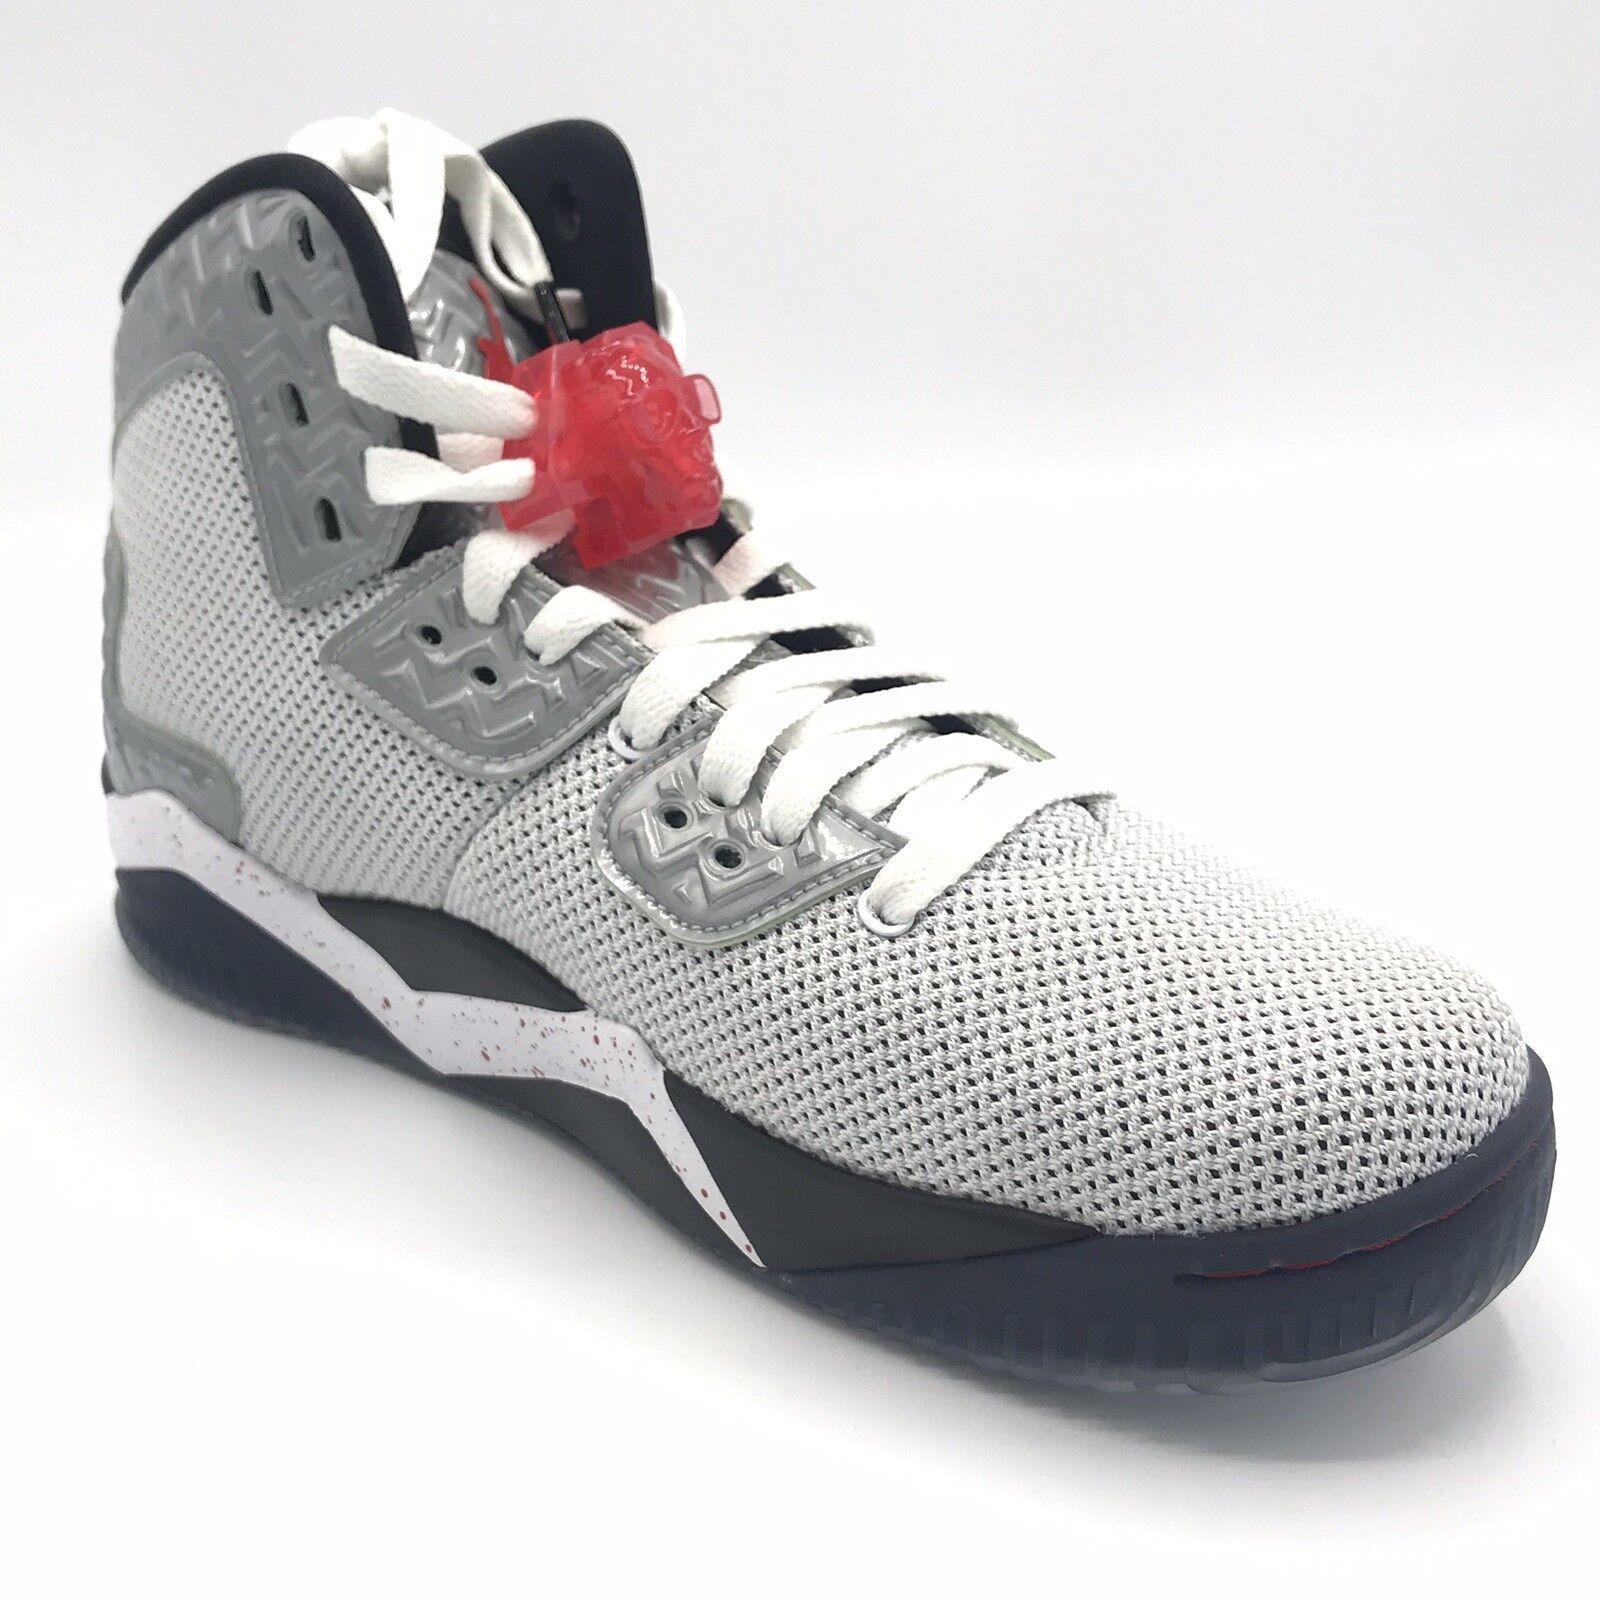 Jordan Spike Forty PE Mens 807541-101 Weiß Fire rot Basketball schuhe Größe 8